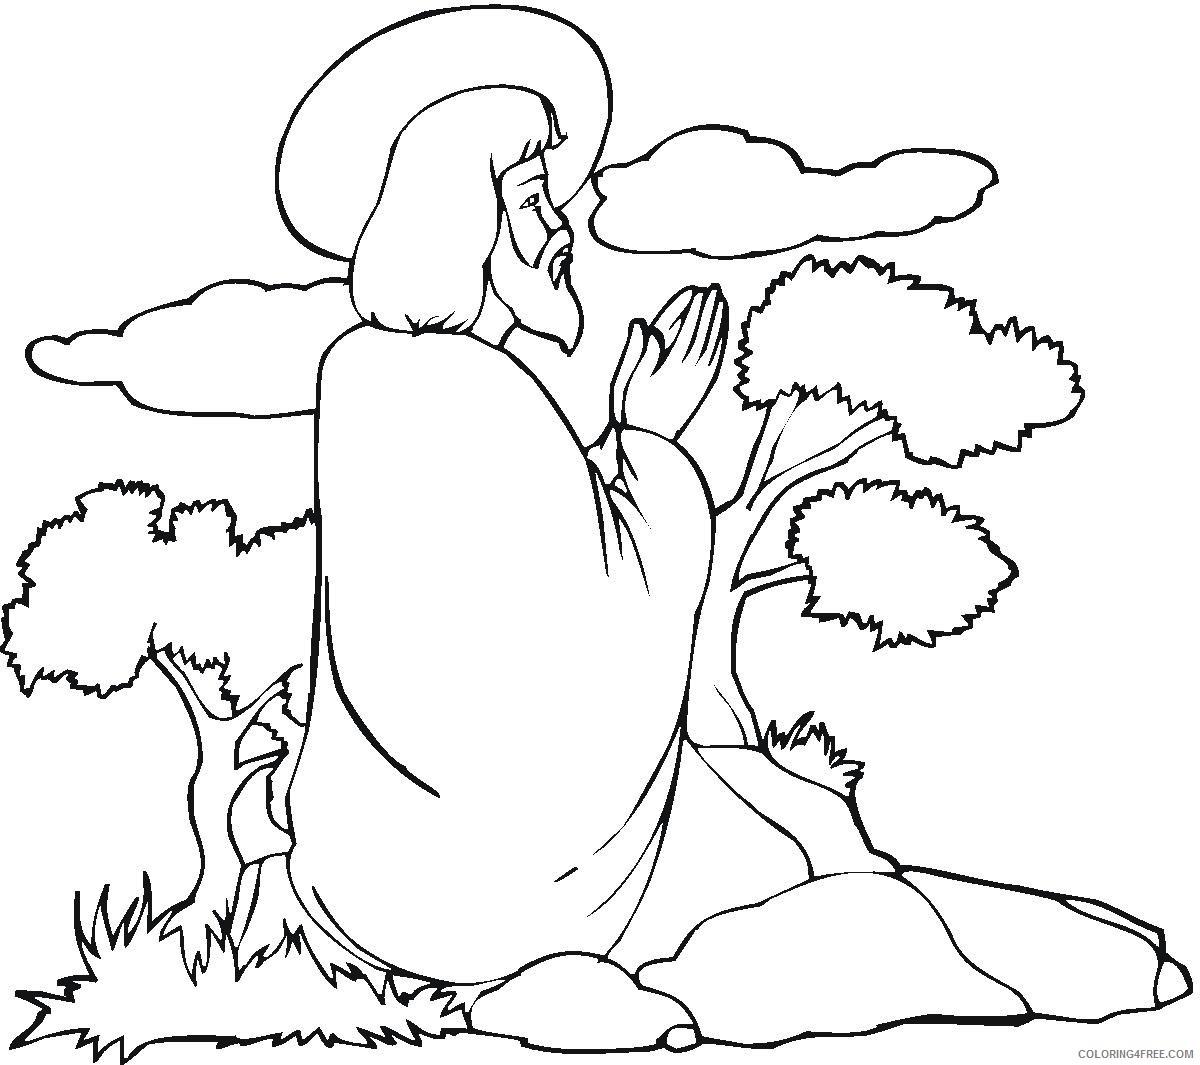 jesus coloring pages praying to god Coloring4free